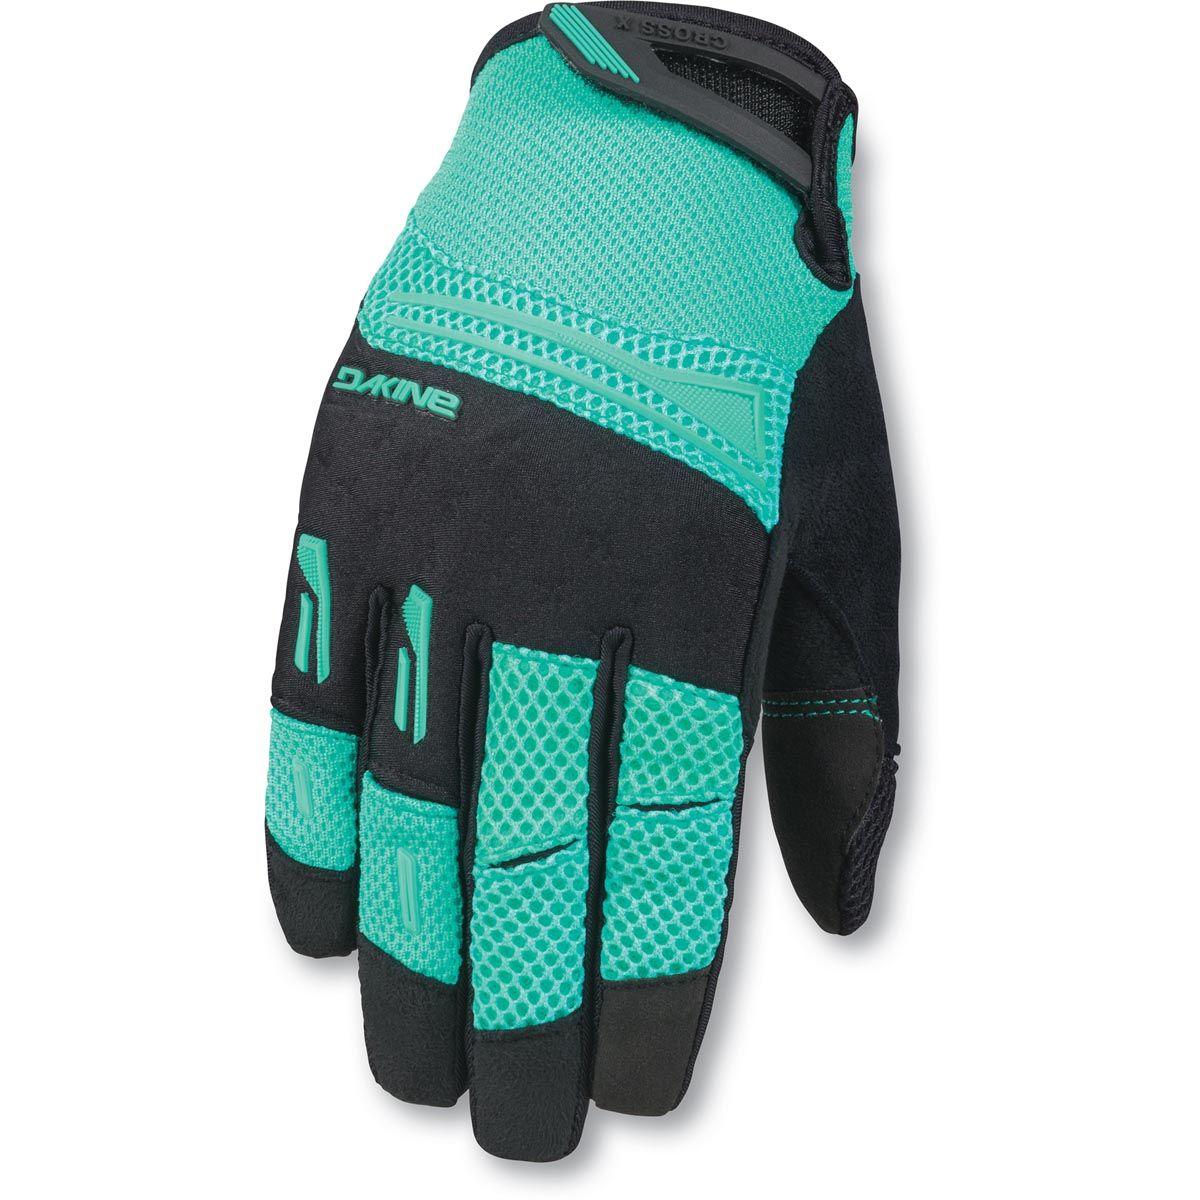 41f29d1a7cc0d Dakine Womens Cross-X Glove Damen Bike Handschuhe Aqua Green ...